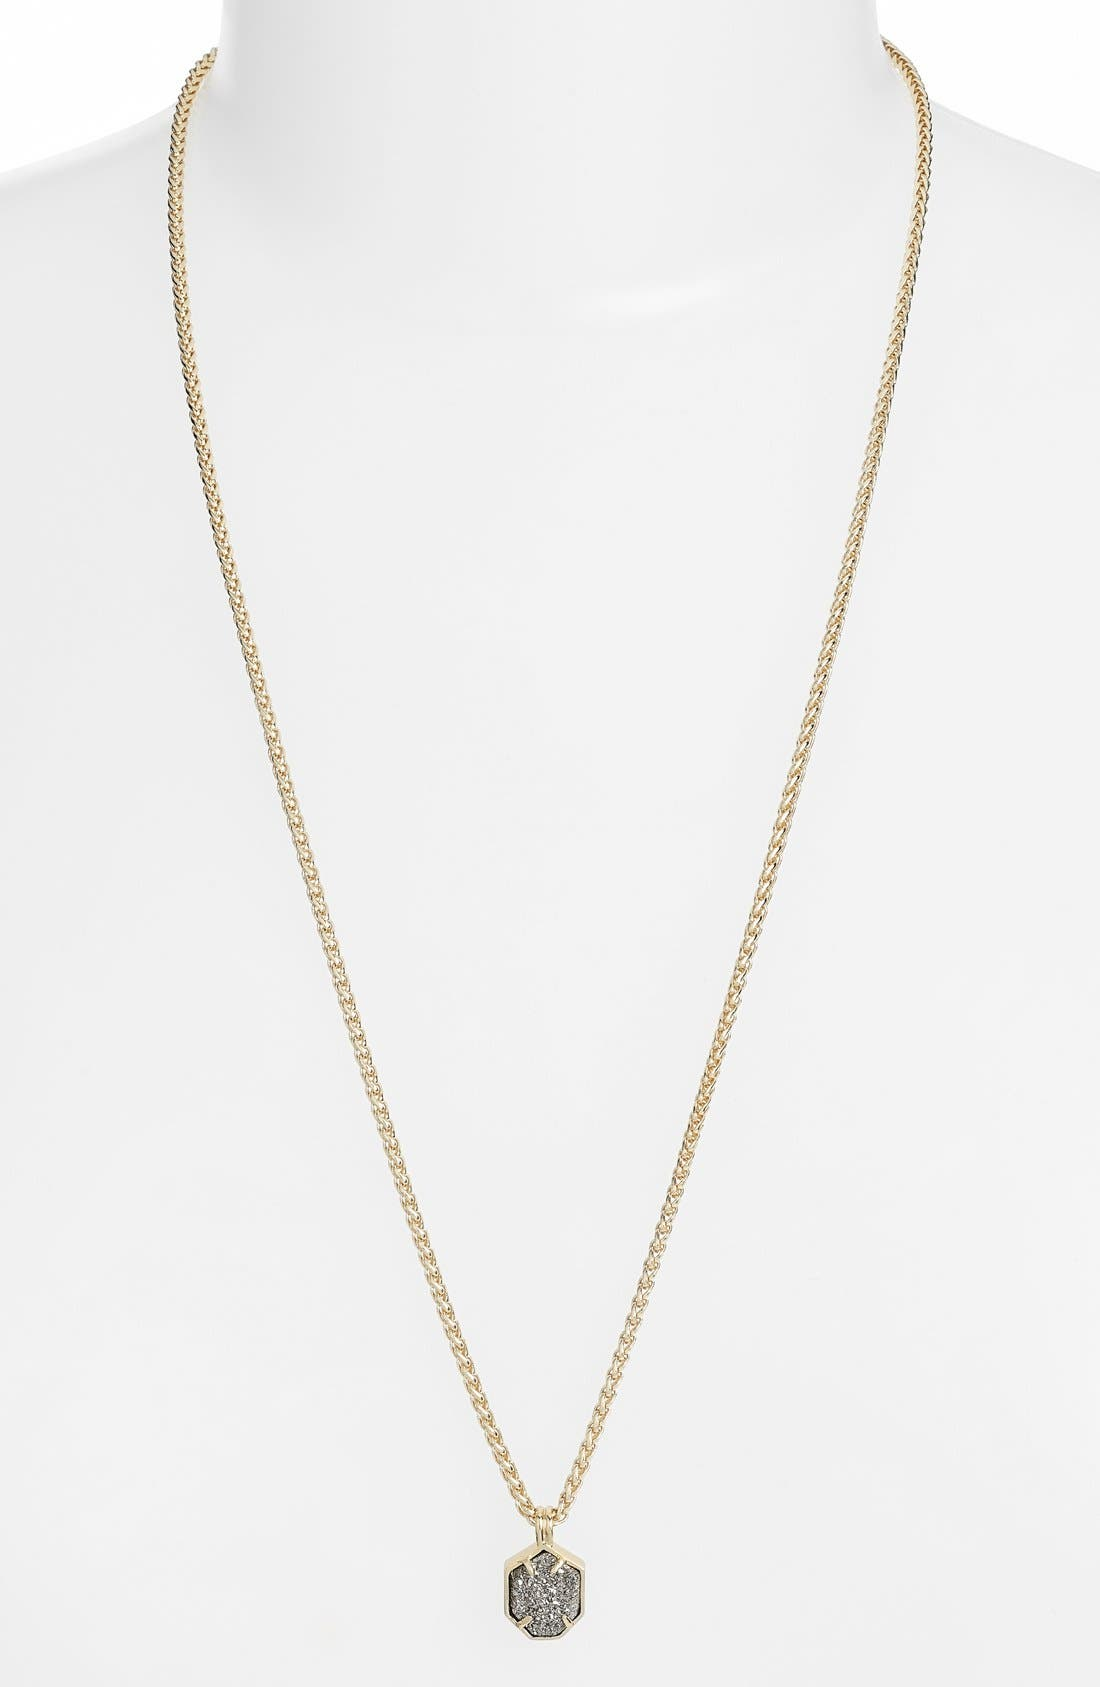 Alternate Image 1 Selected - Kendra Scott 'Oliver' Pendant Necklace